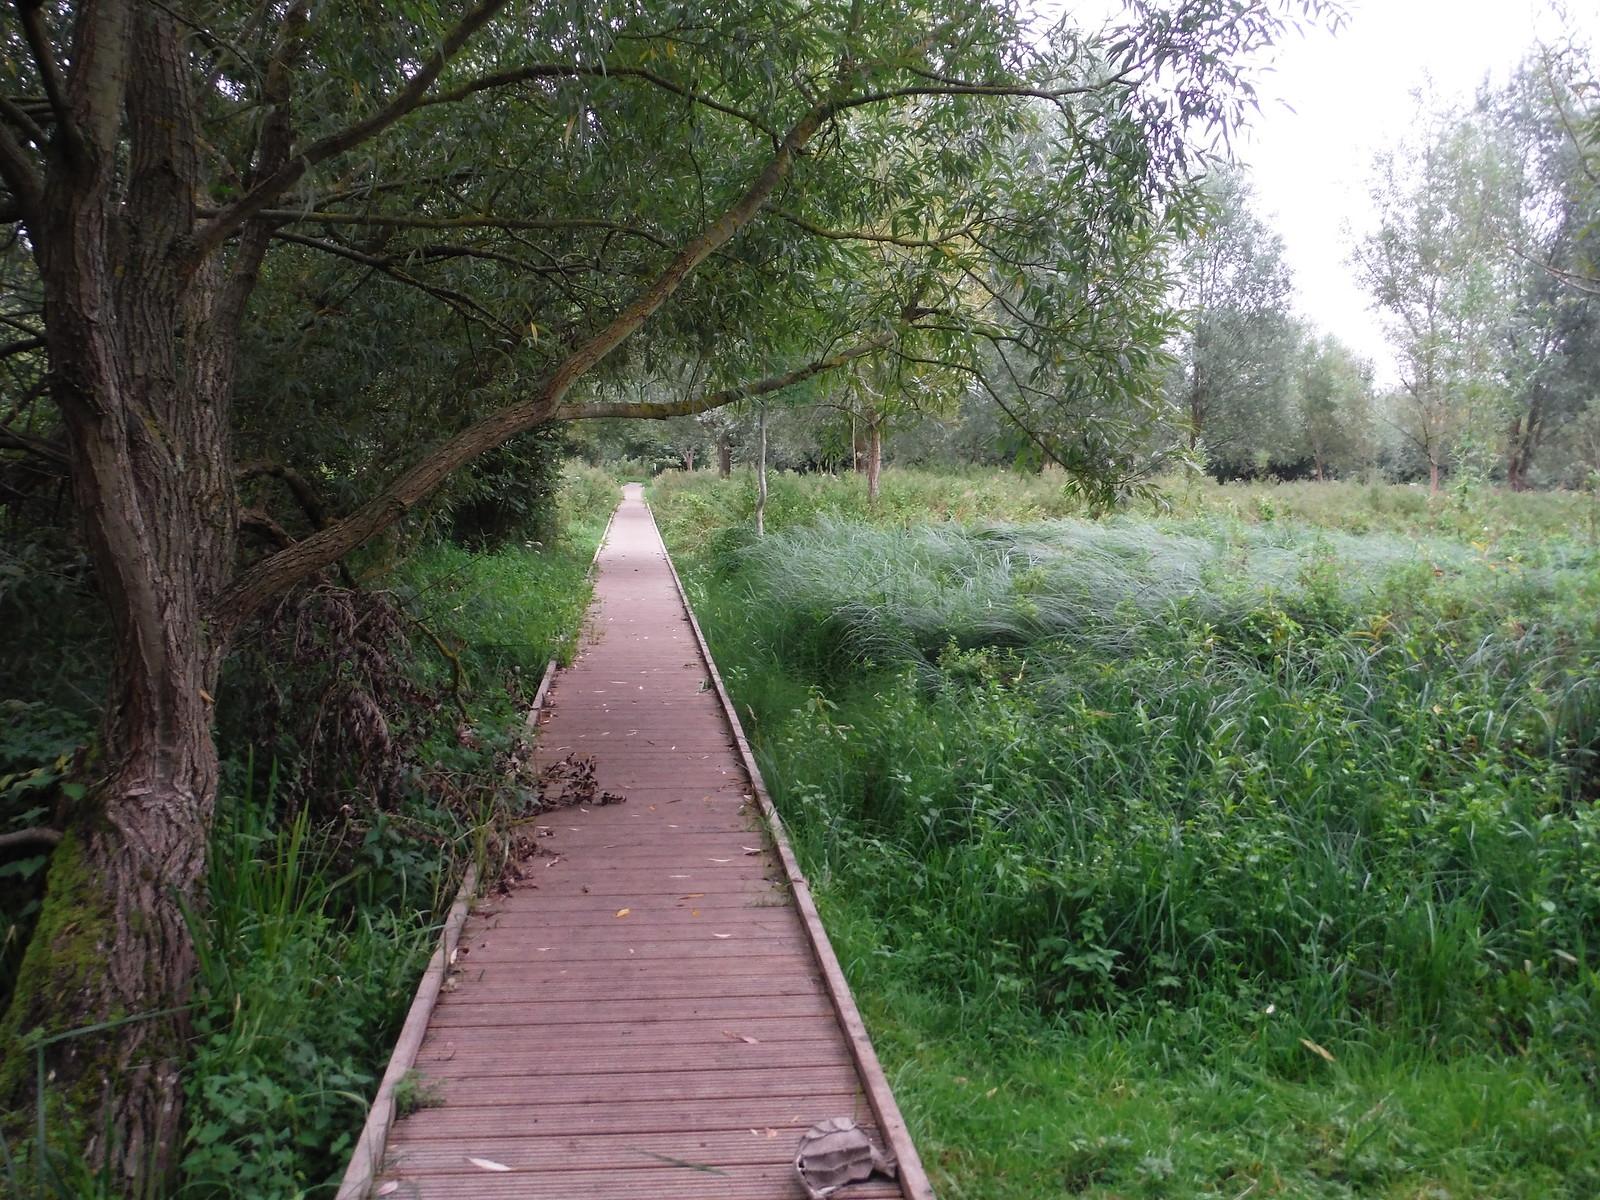 From Pishiobury Park to the Stort Navigation (II) SWC Walk 164 Roydon to Sawbridgeworth via Henry Moore Foundation